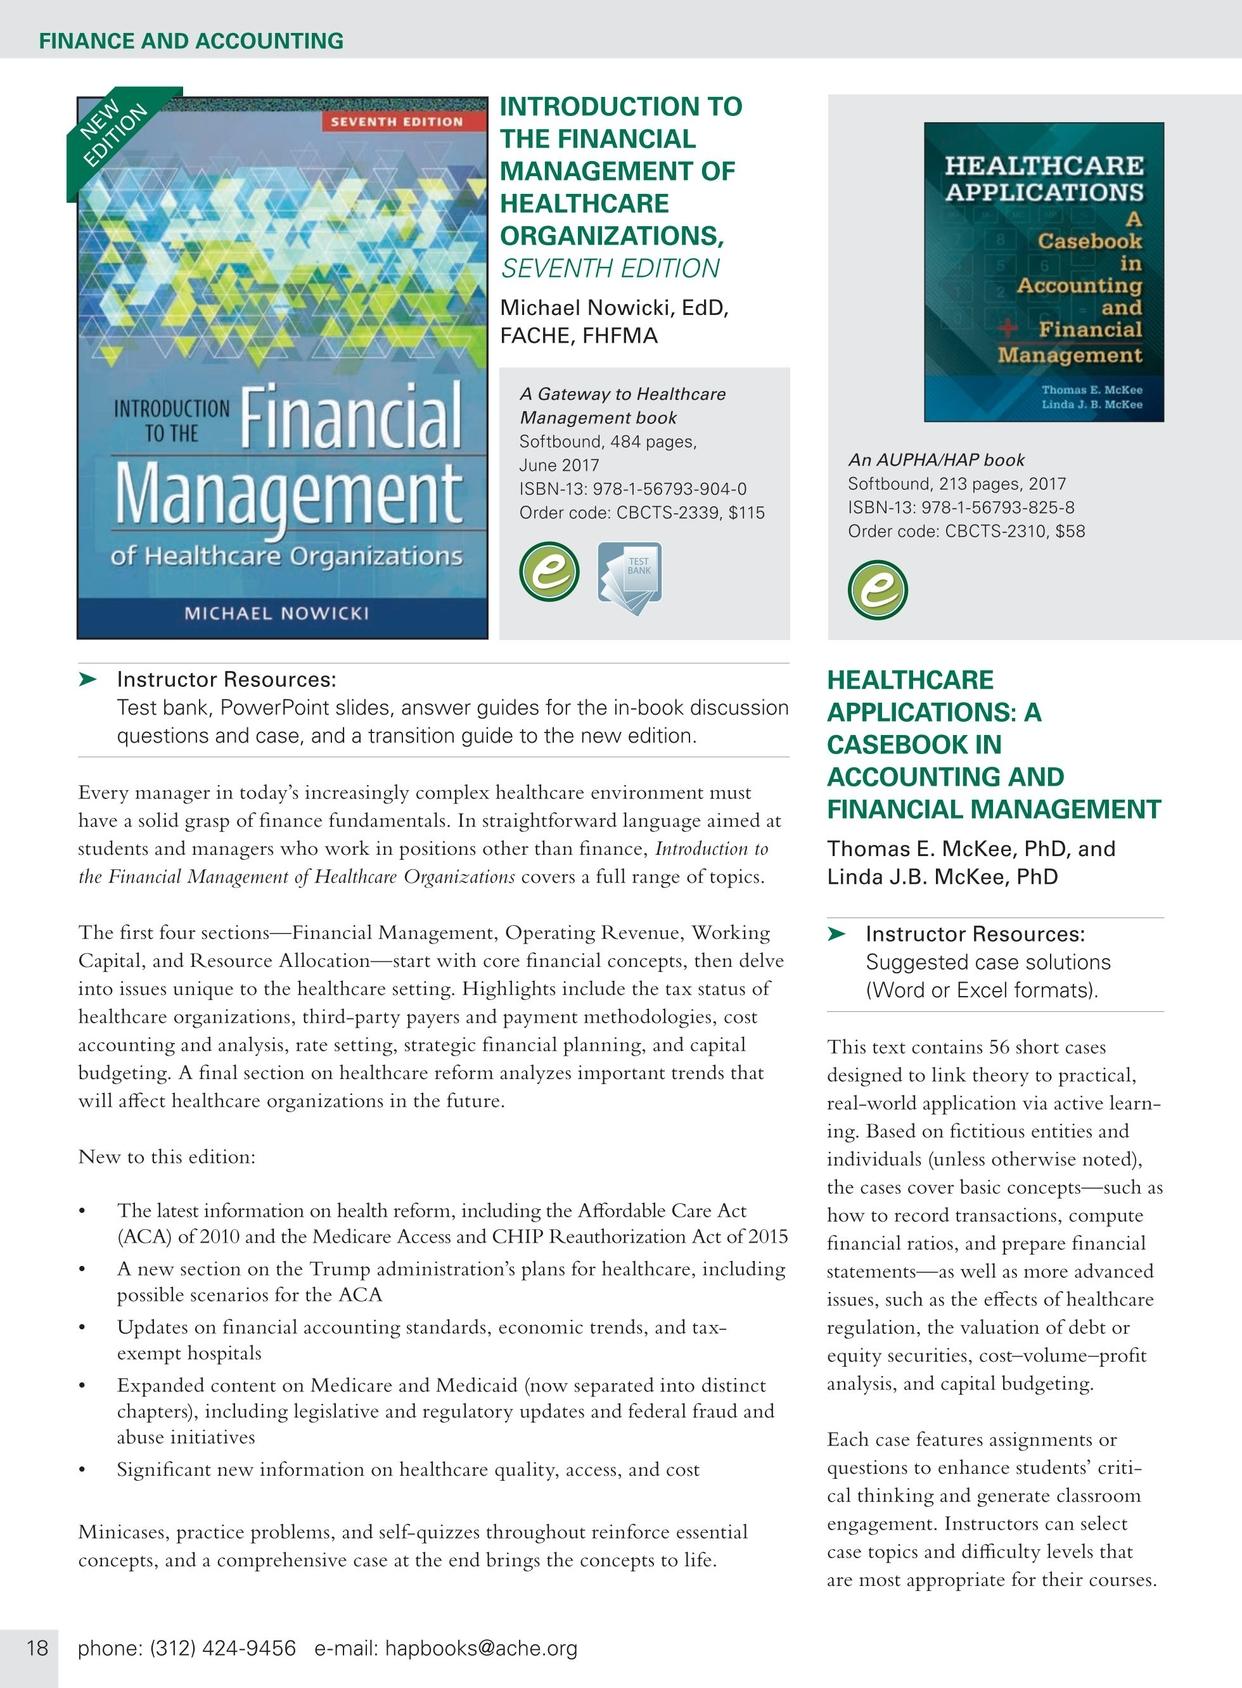 financial environment of healthcare organizations